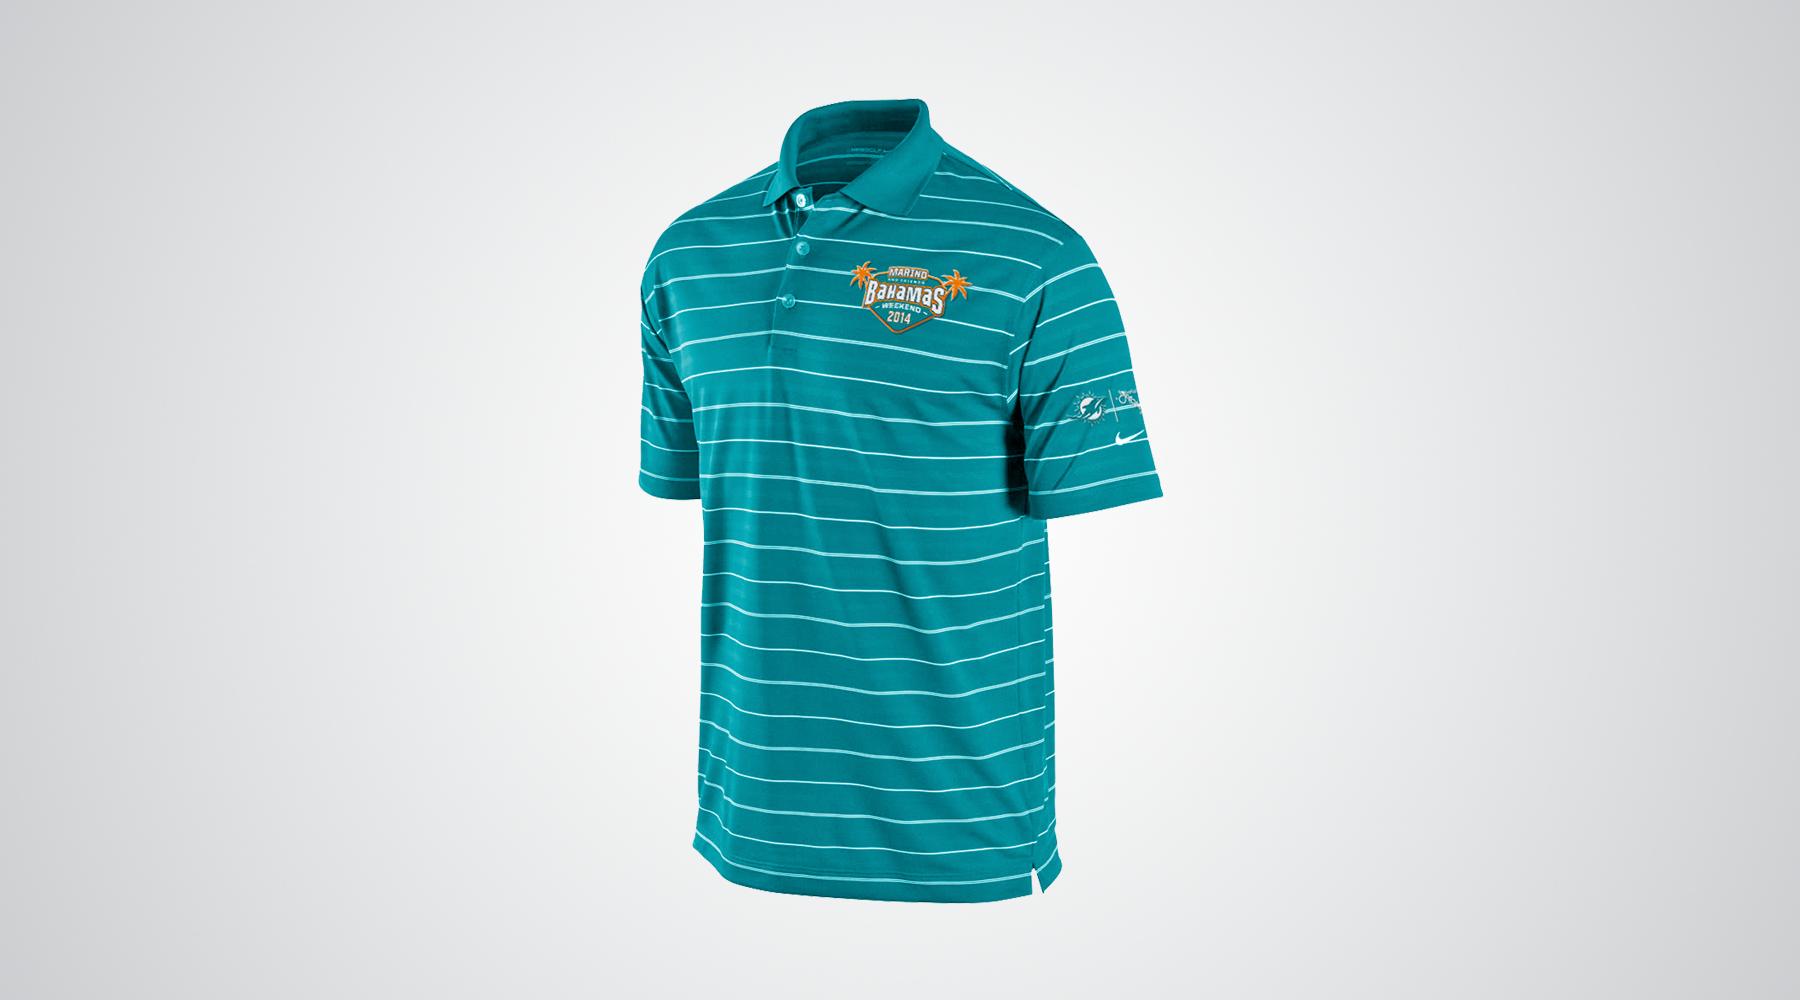 9ae332dca Miami Dolphins Polo Shirts